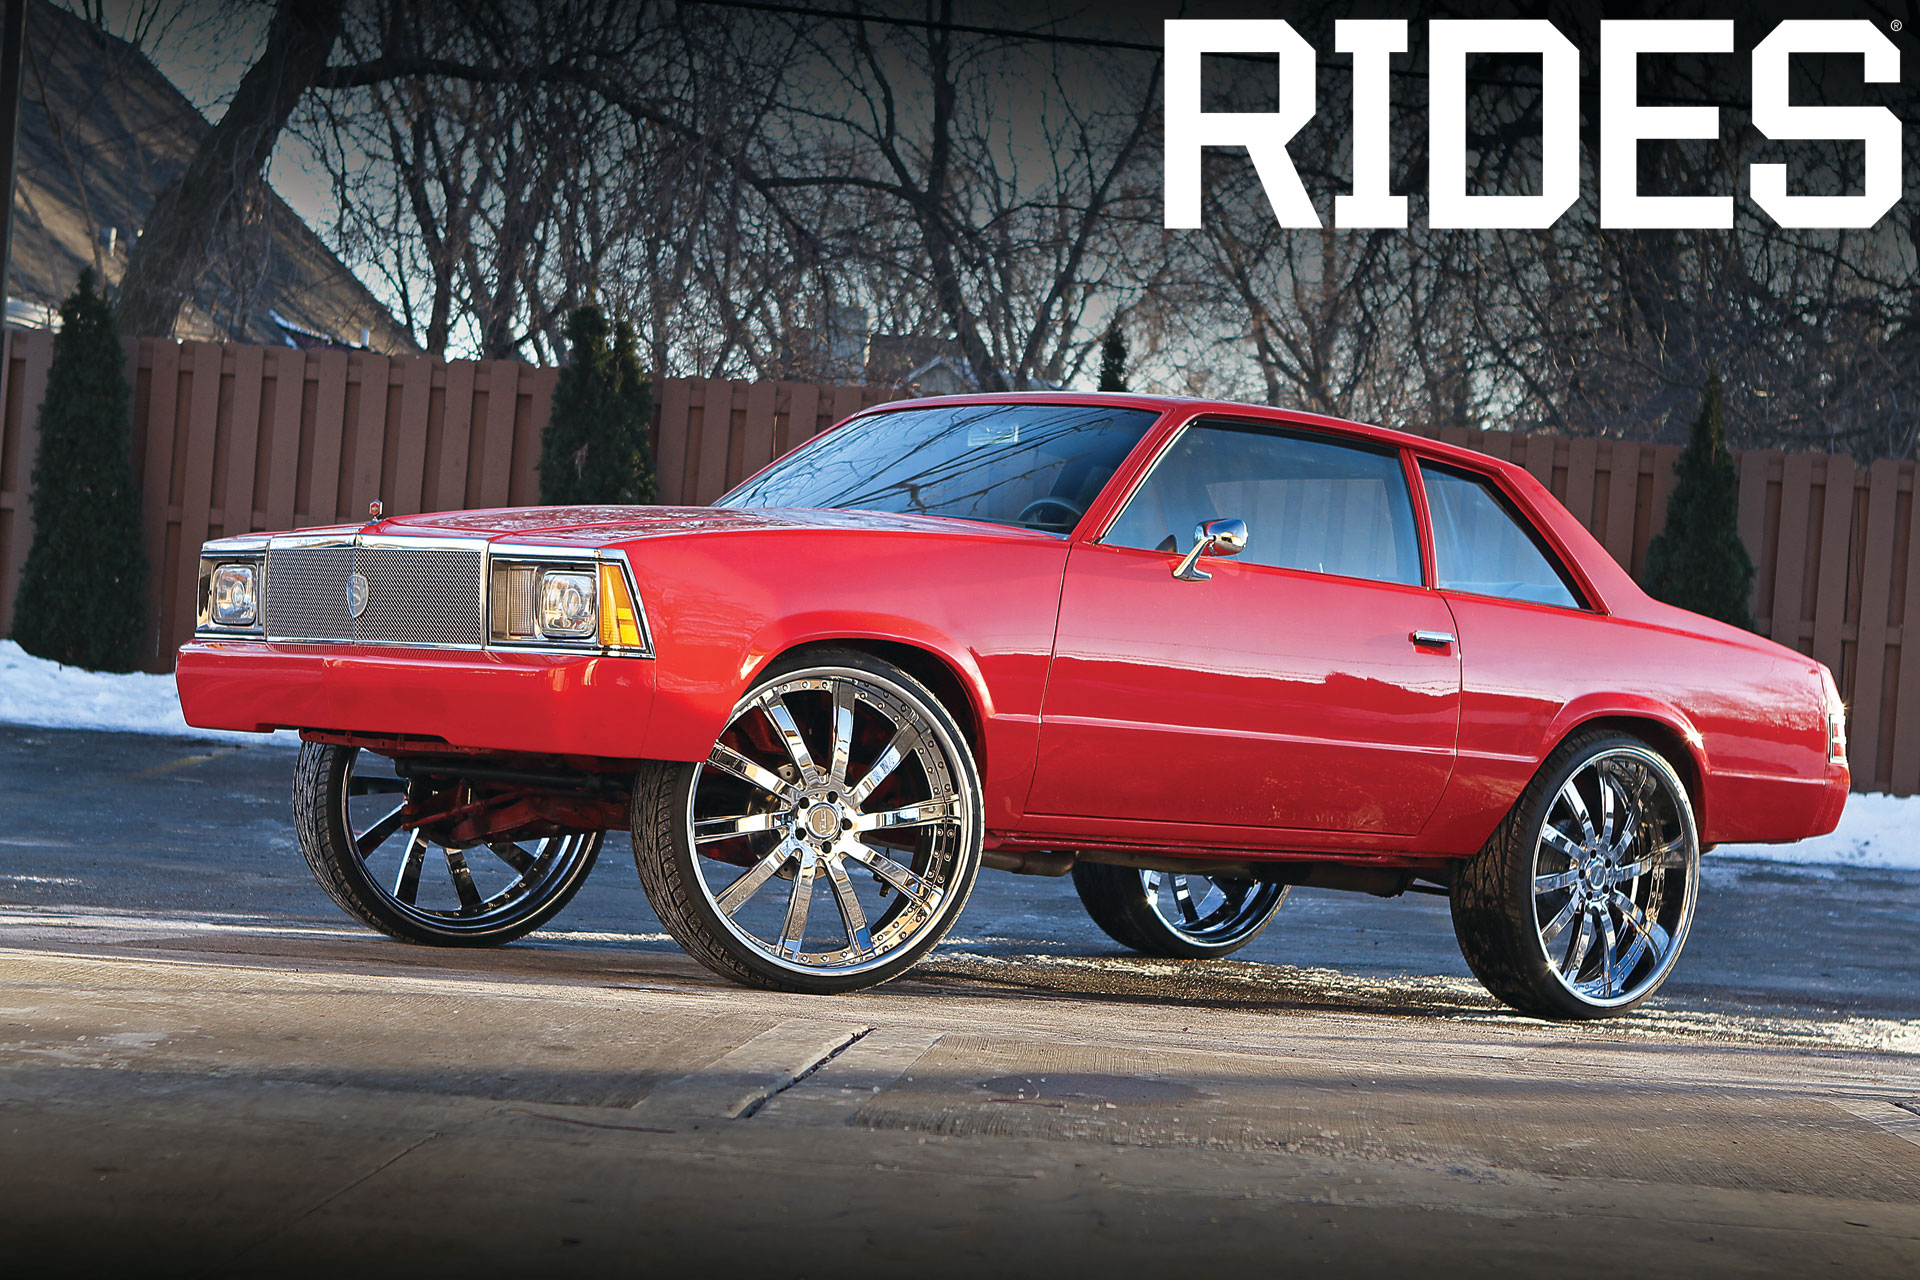 rides cars chevrolet malibu g-body red chevy